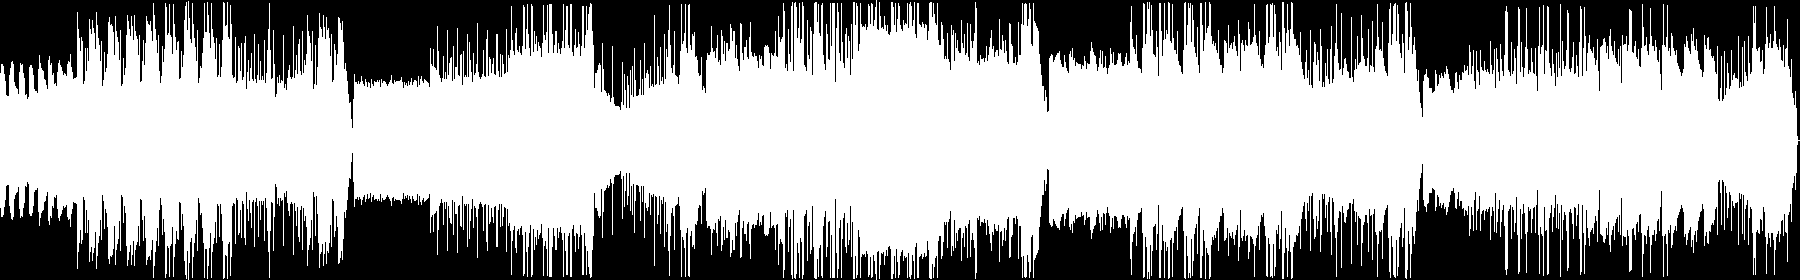 THE RINGER audio waveform